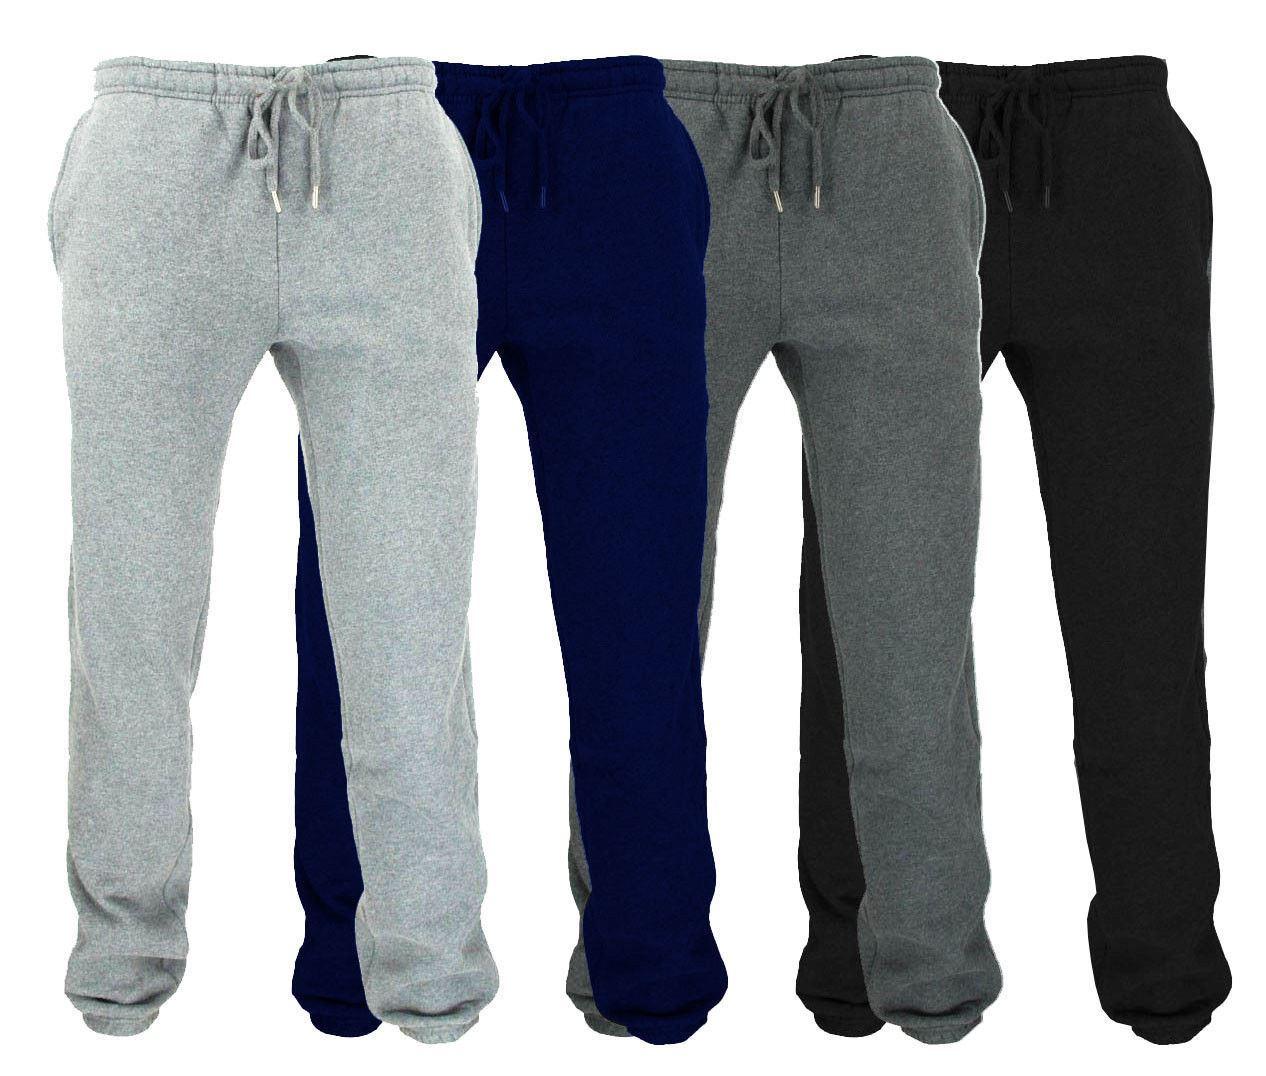 Uomo Pantaloni Tuta seta jogging palestra pantaloni